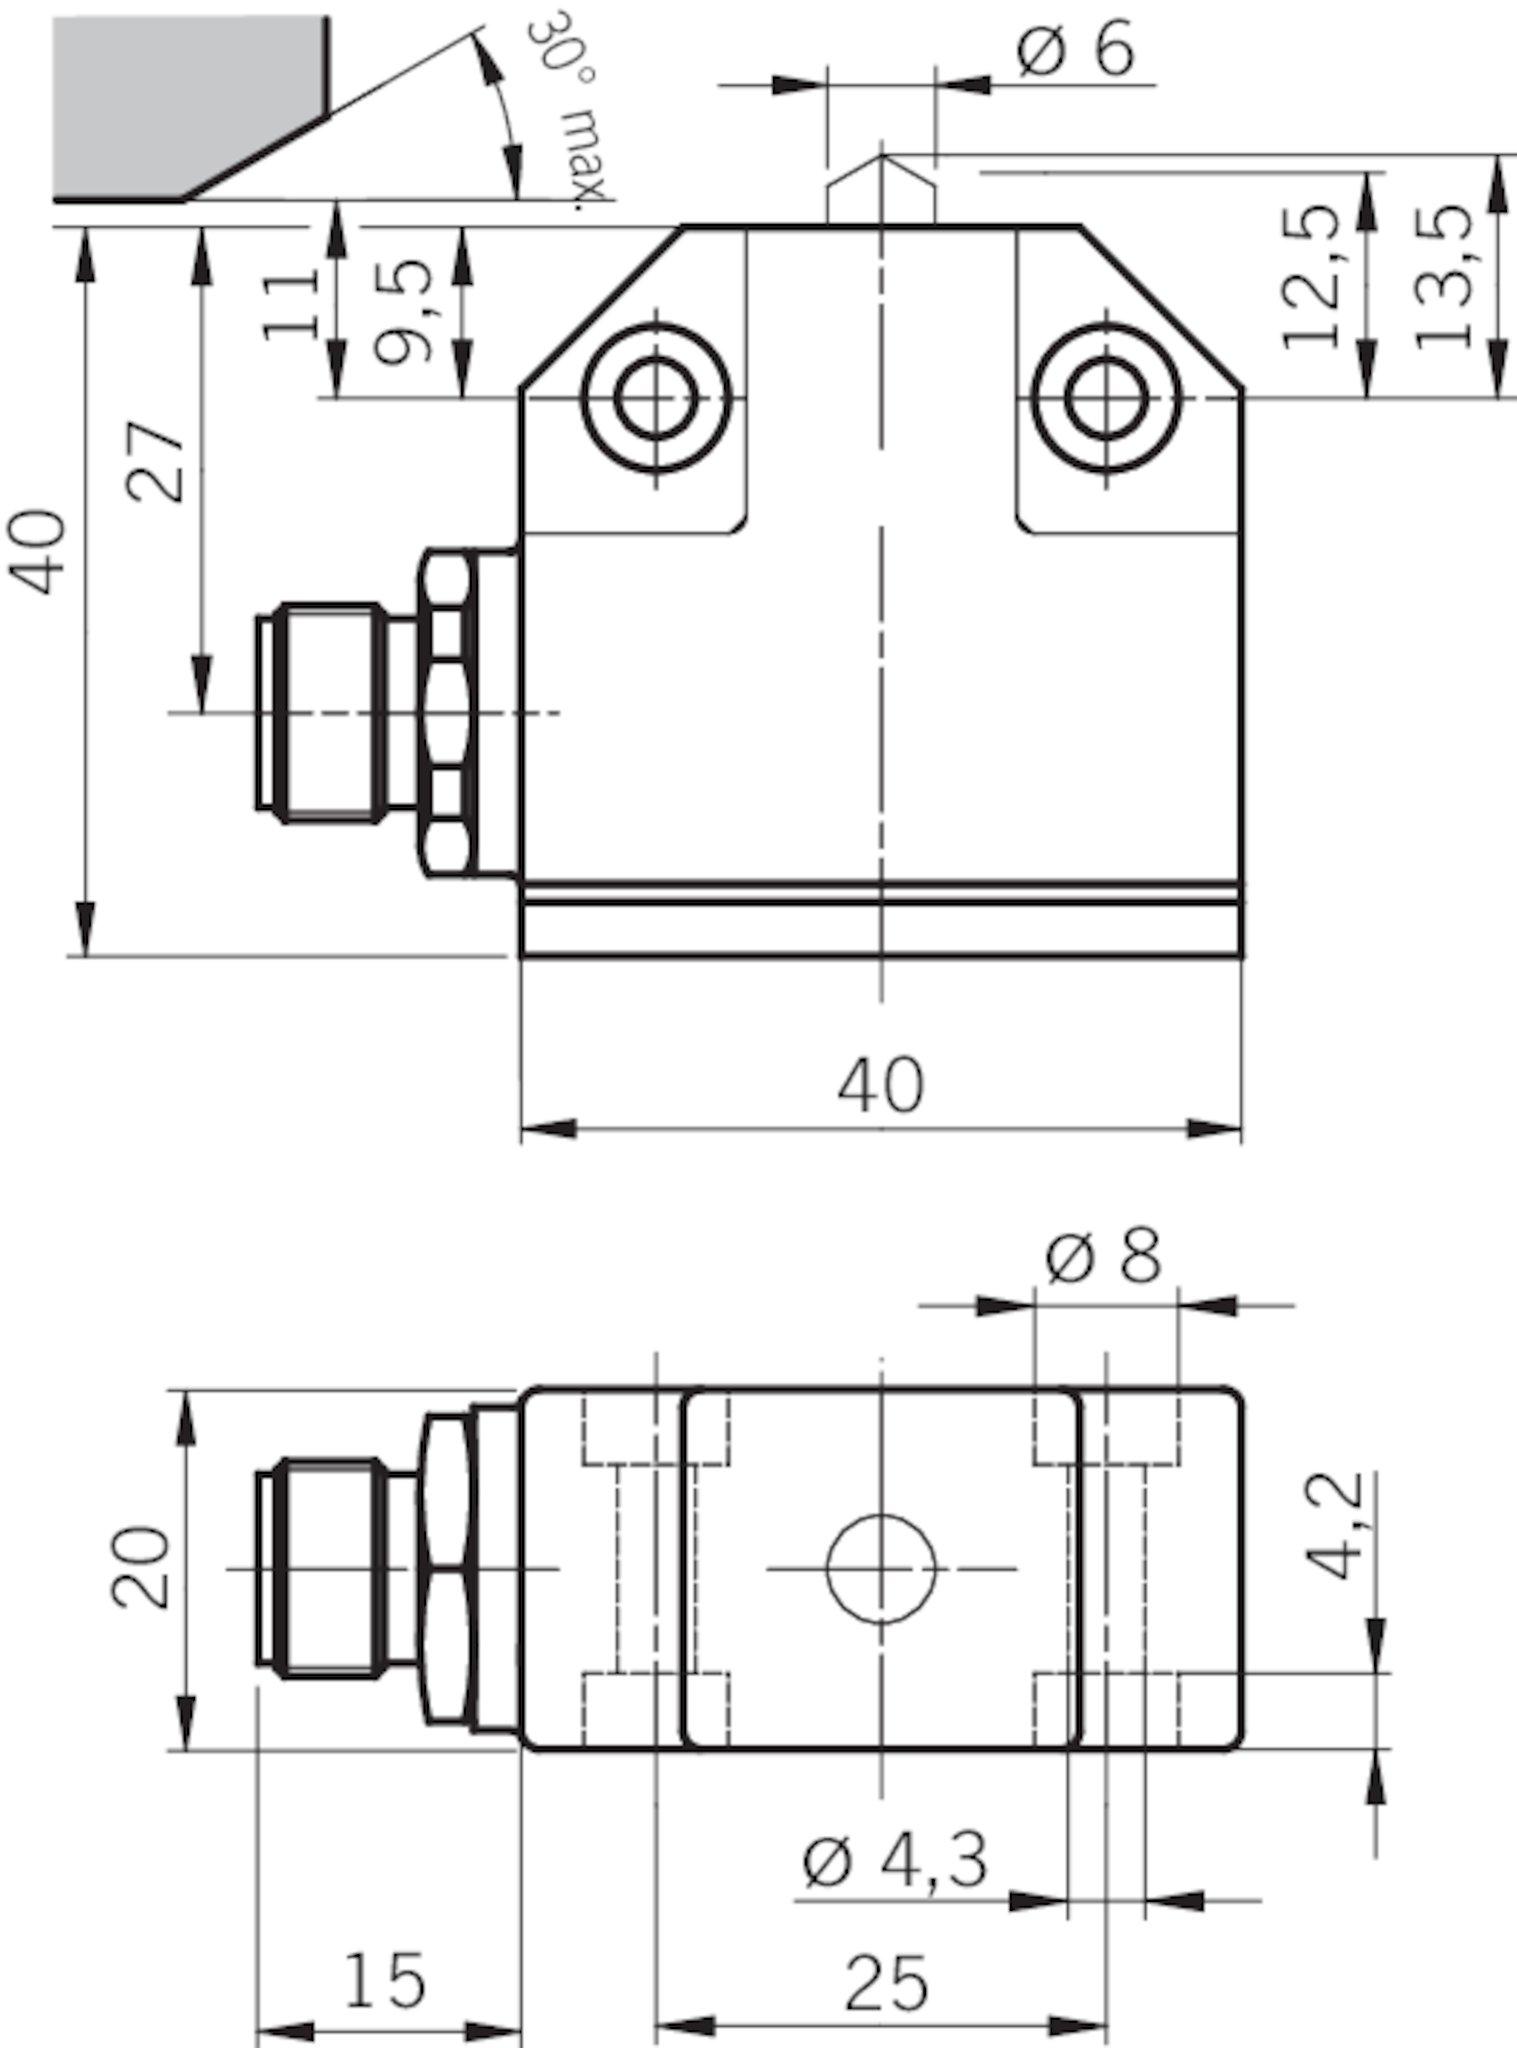 n01d550 mc1526 precision single limit switch n01 chisel. Black Bedroom Furniture Sets. Home Design Ideas